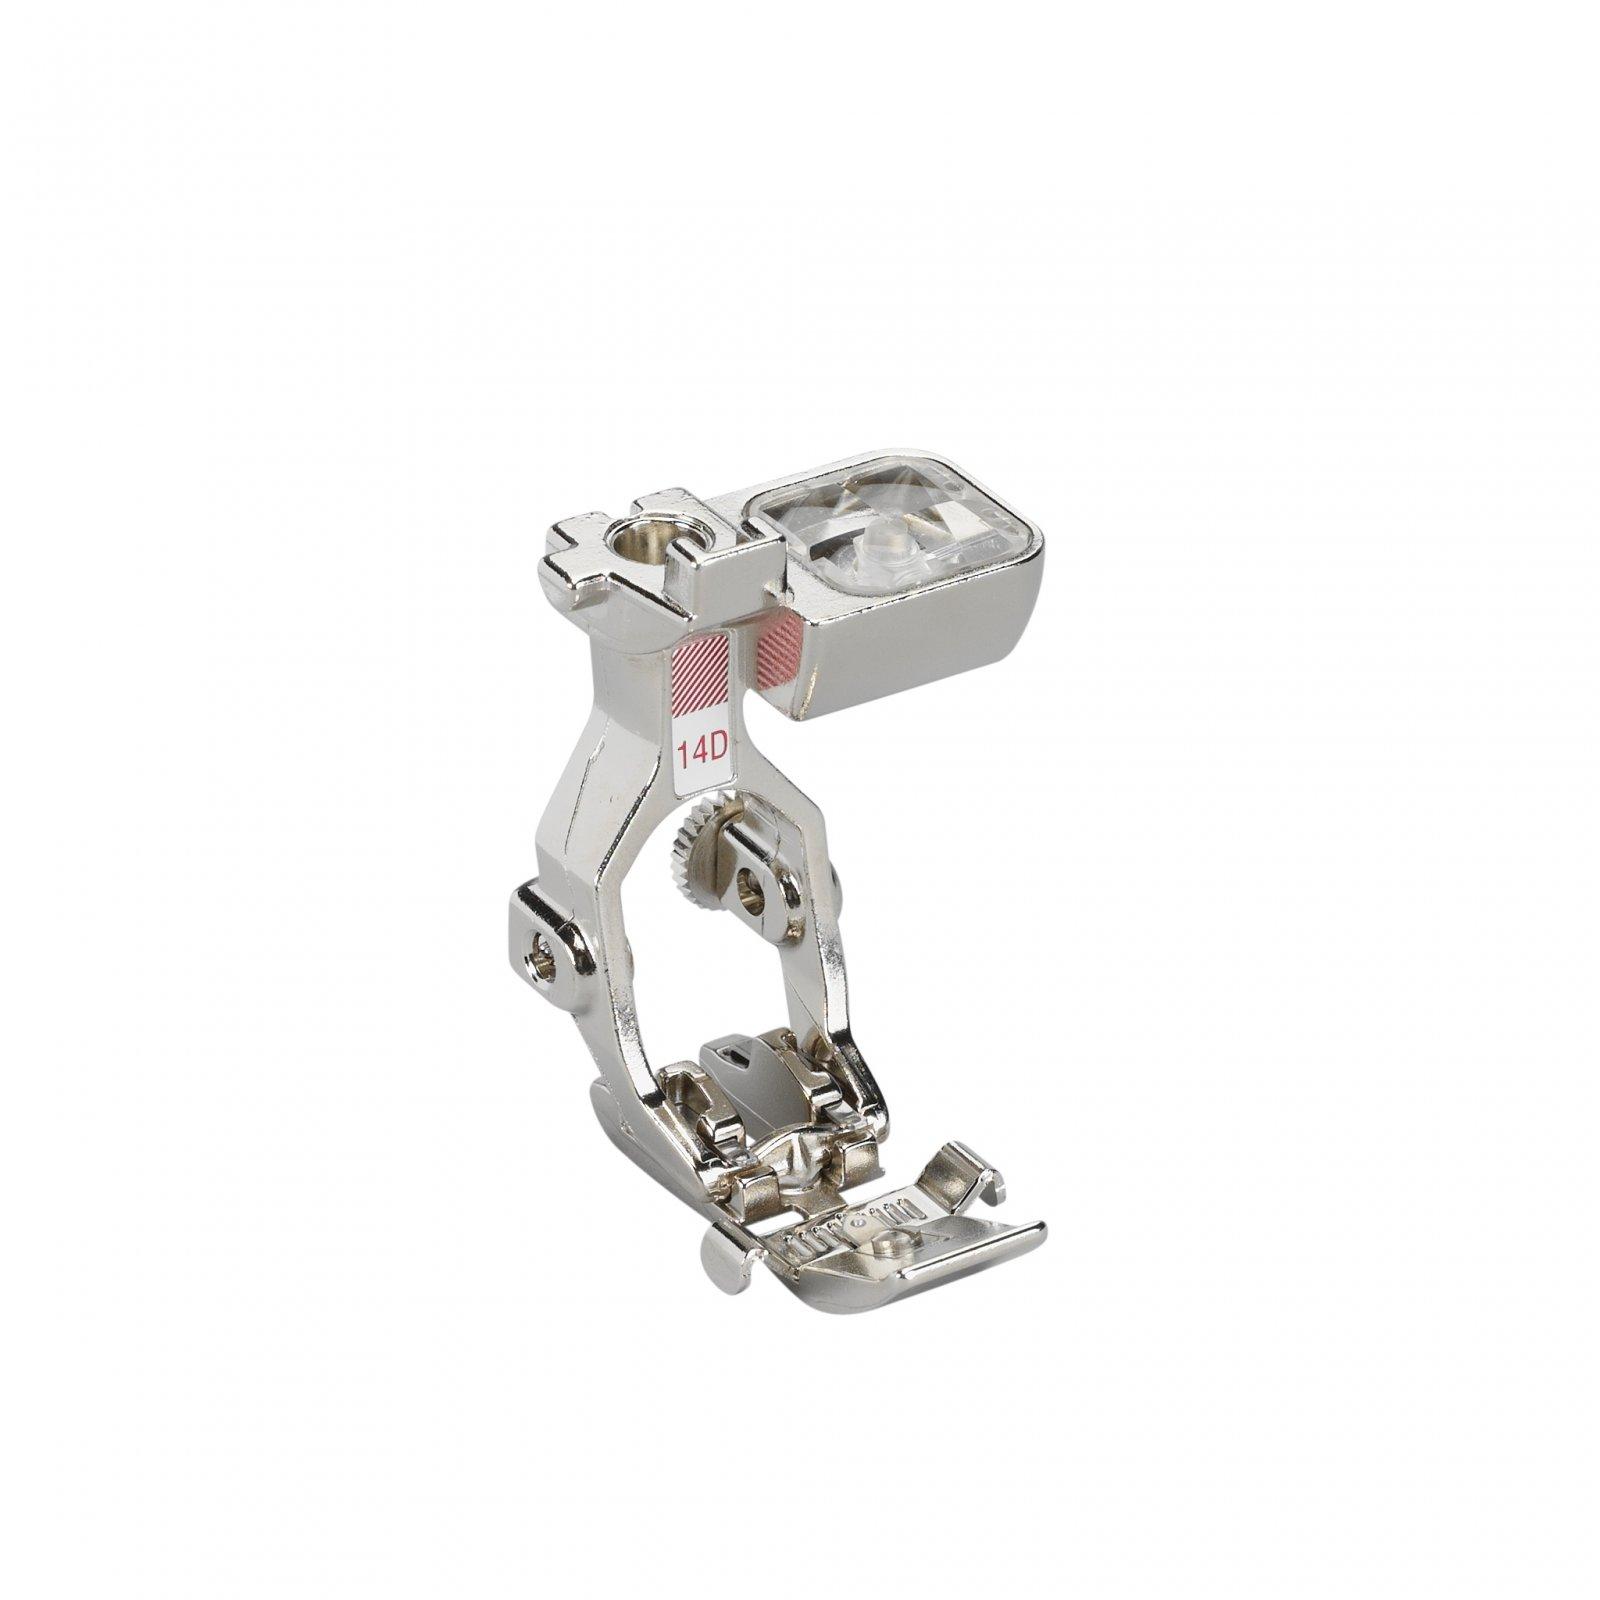 #14D Zipper Foot with Guide BERNINA